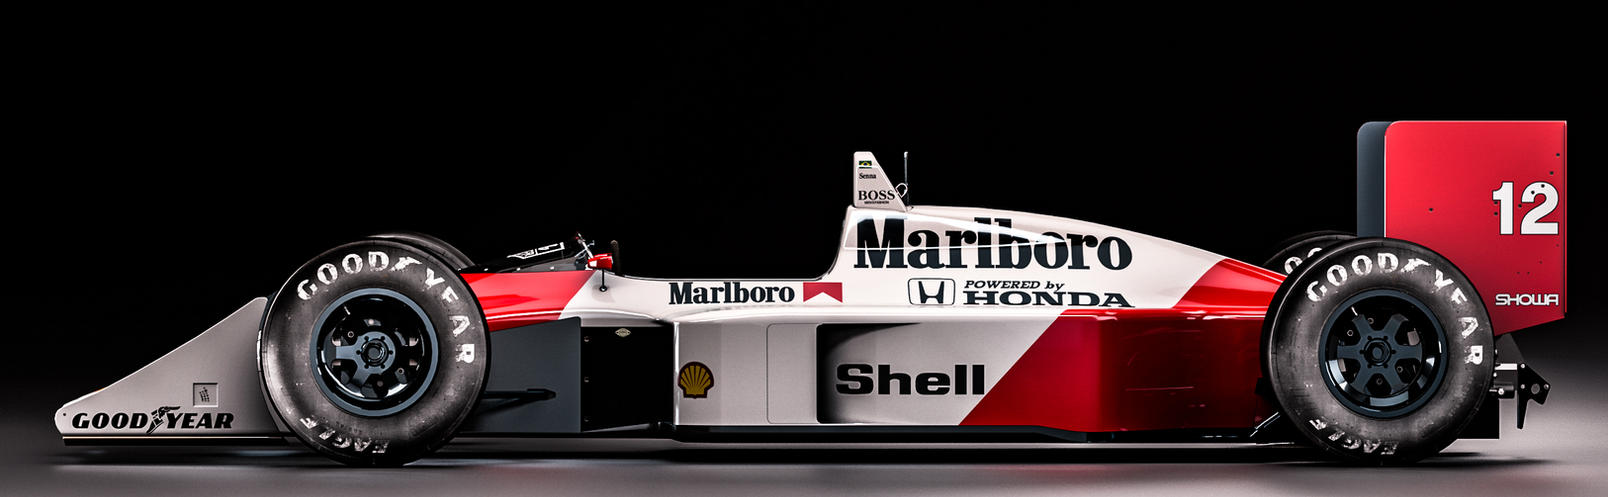 Mclaren Honda MP4/4 - Ayrton Senna by nancorocks on DeviantArt